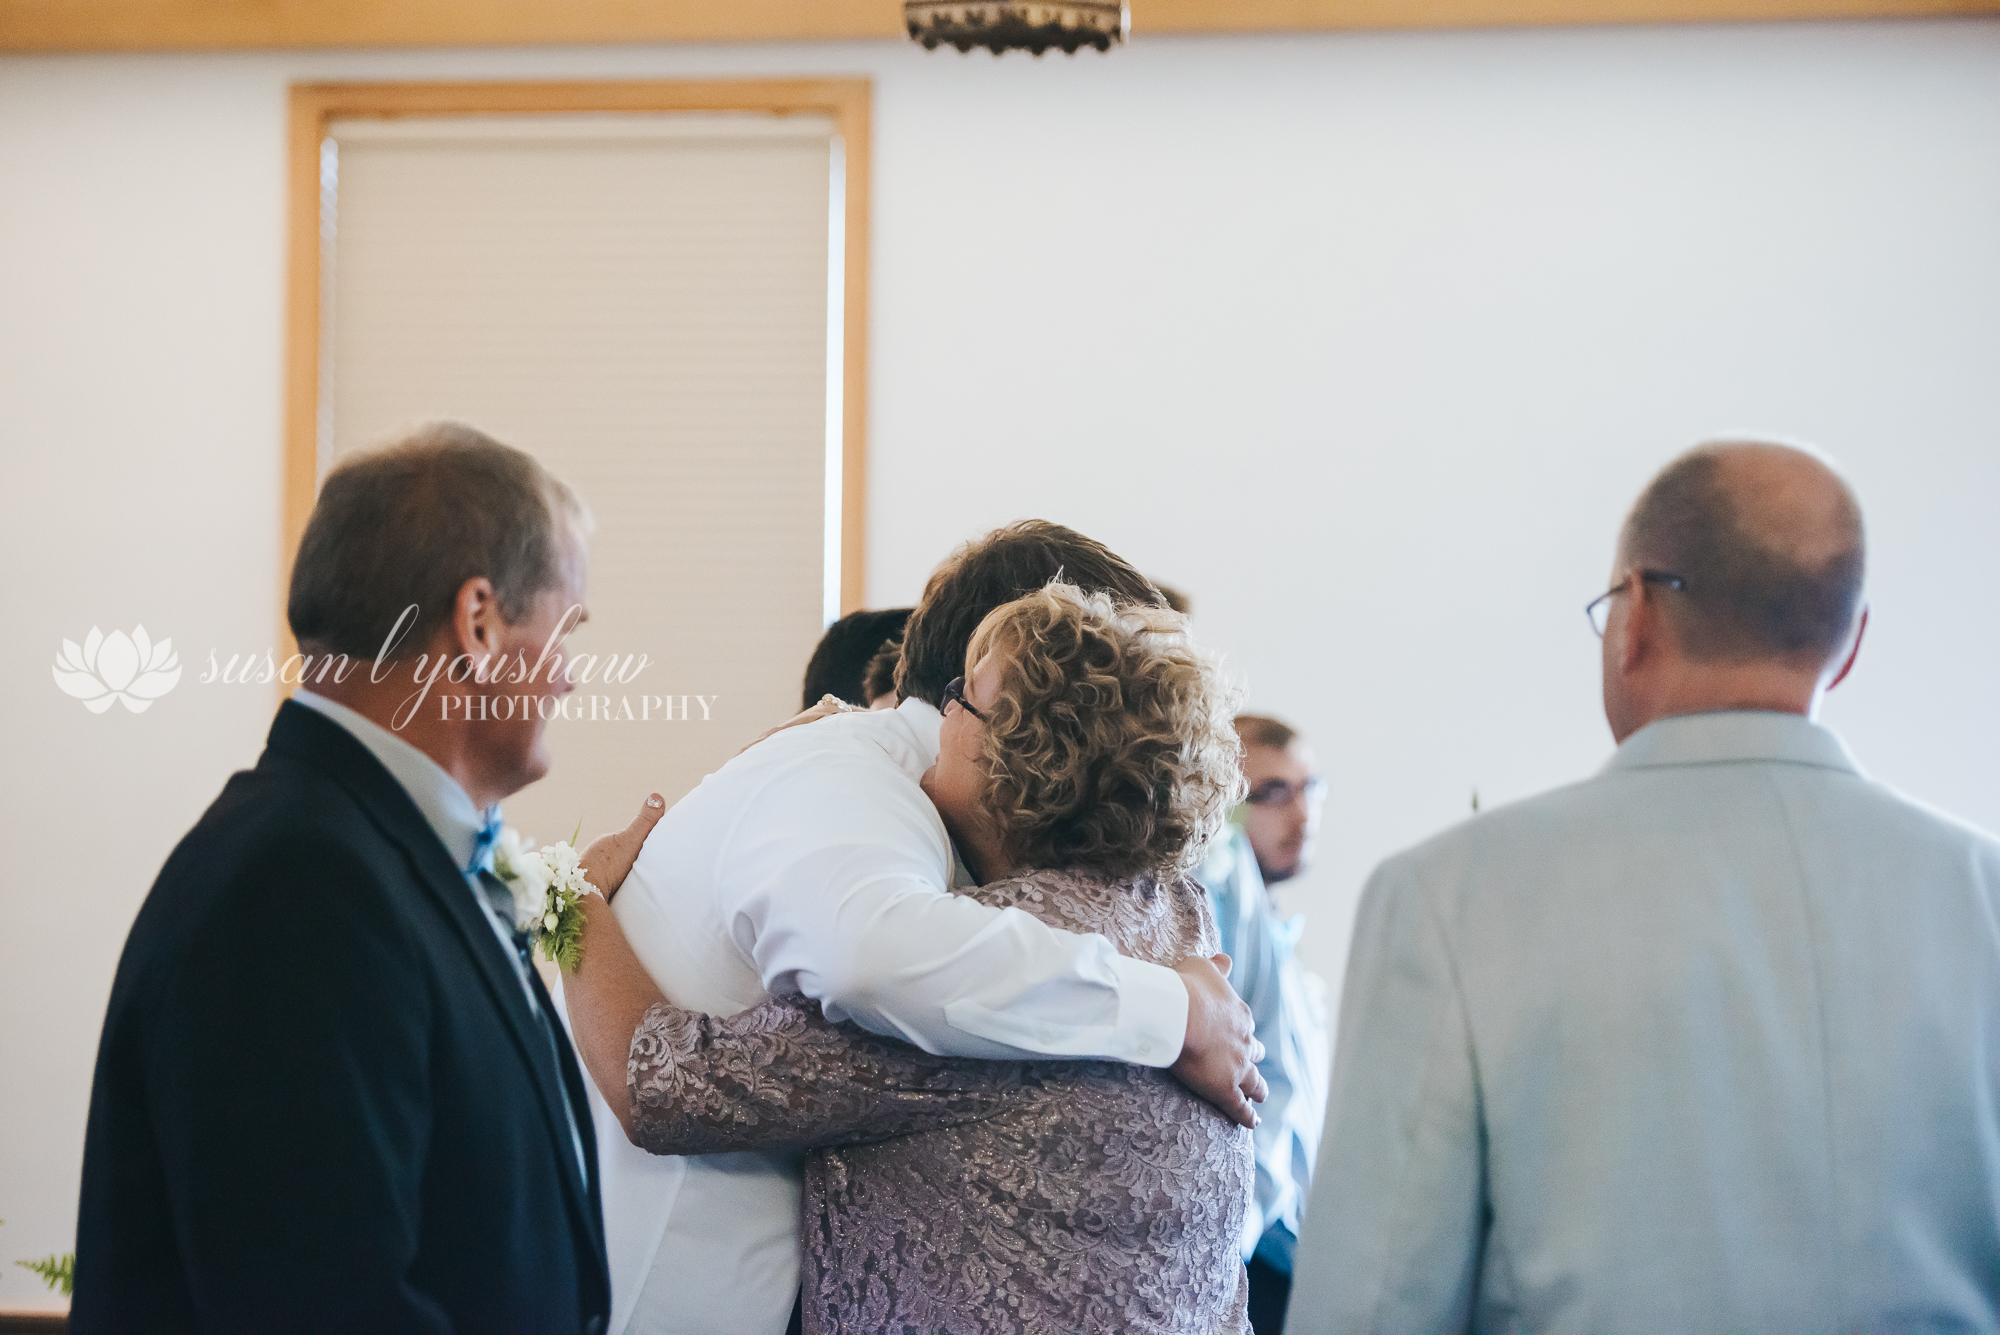 Katelyn and Wes Wedding Photos 07-13-2019 SLY Photography-47.jpg